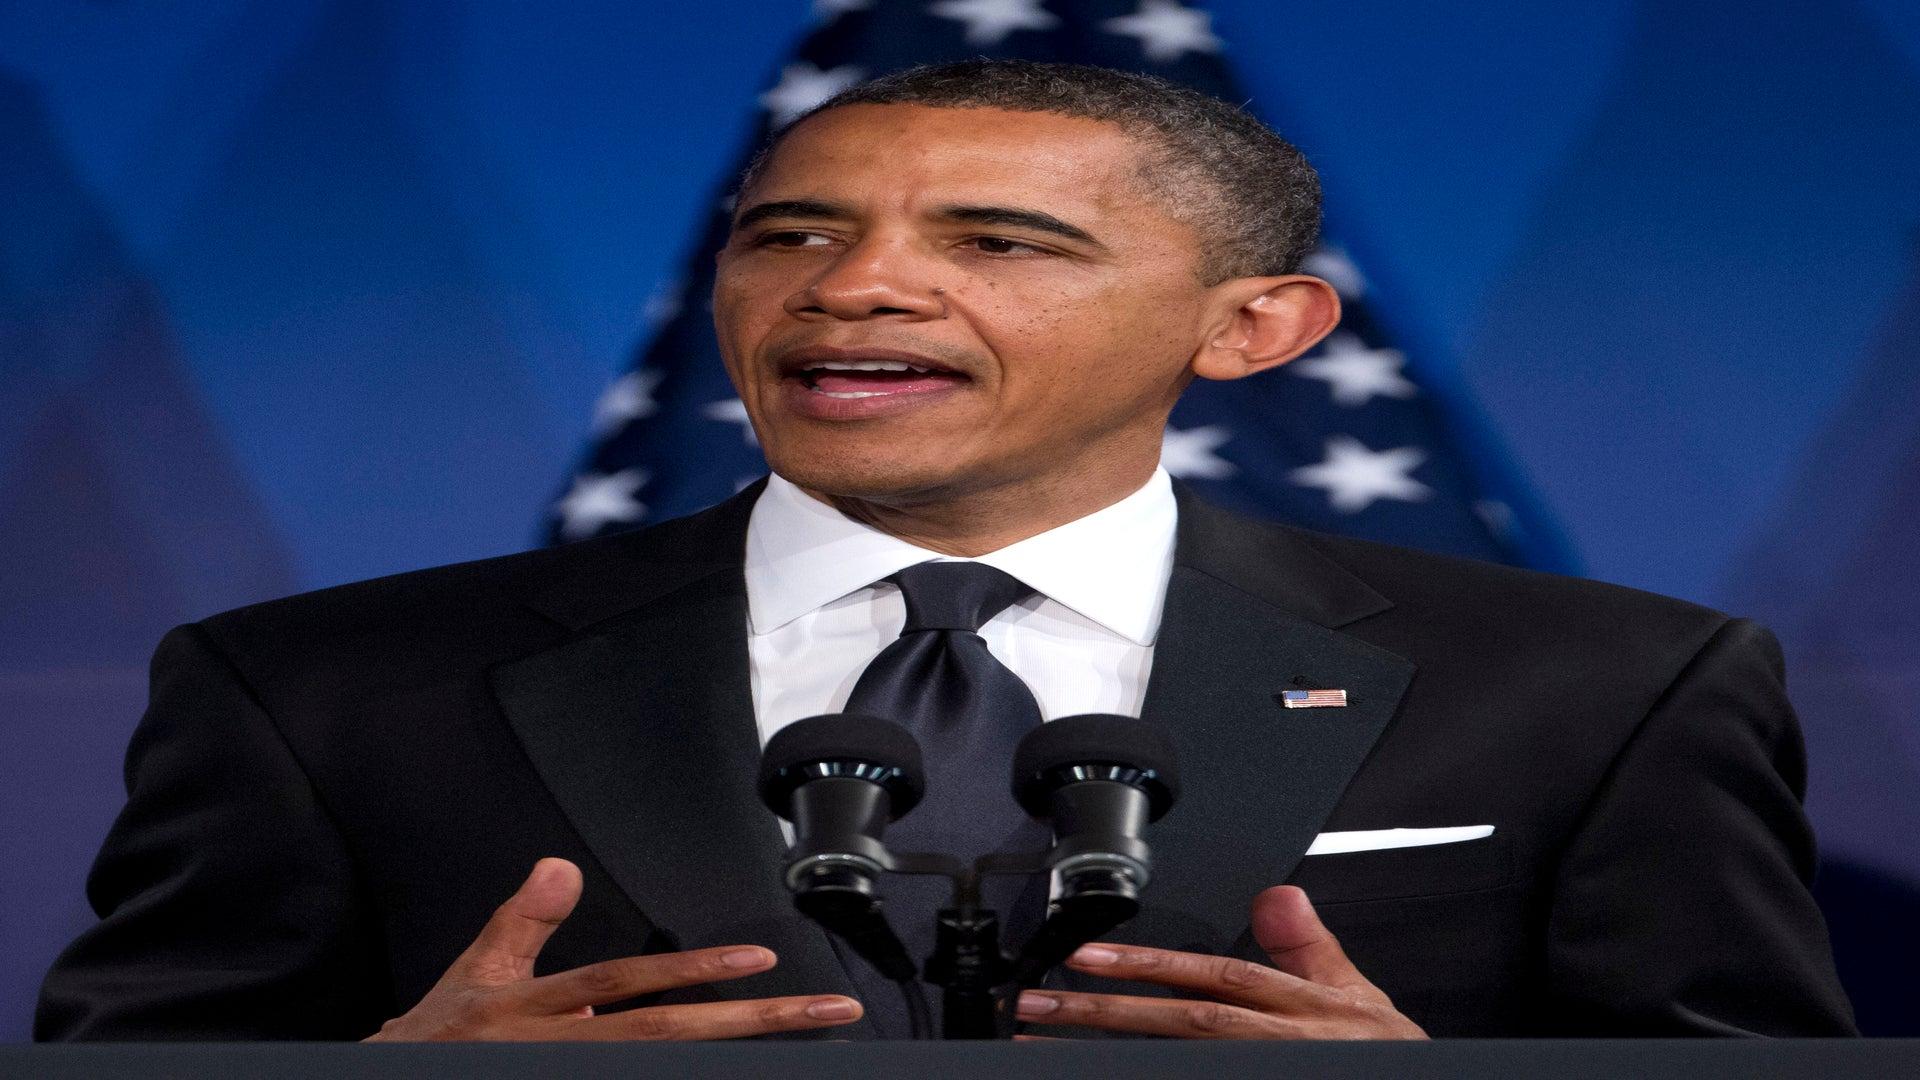 President Obama Officially Endorses Gay Marriage